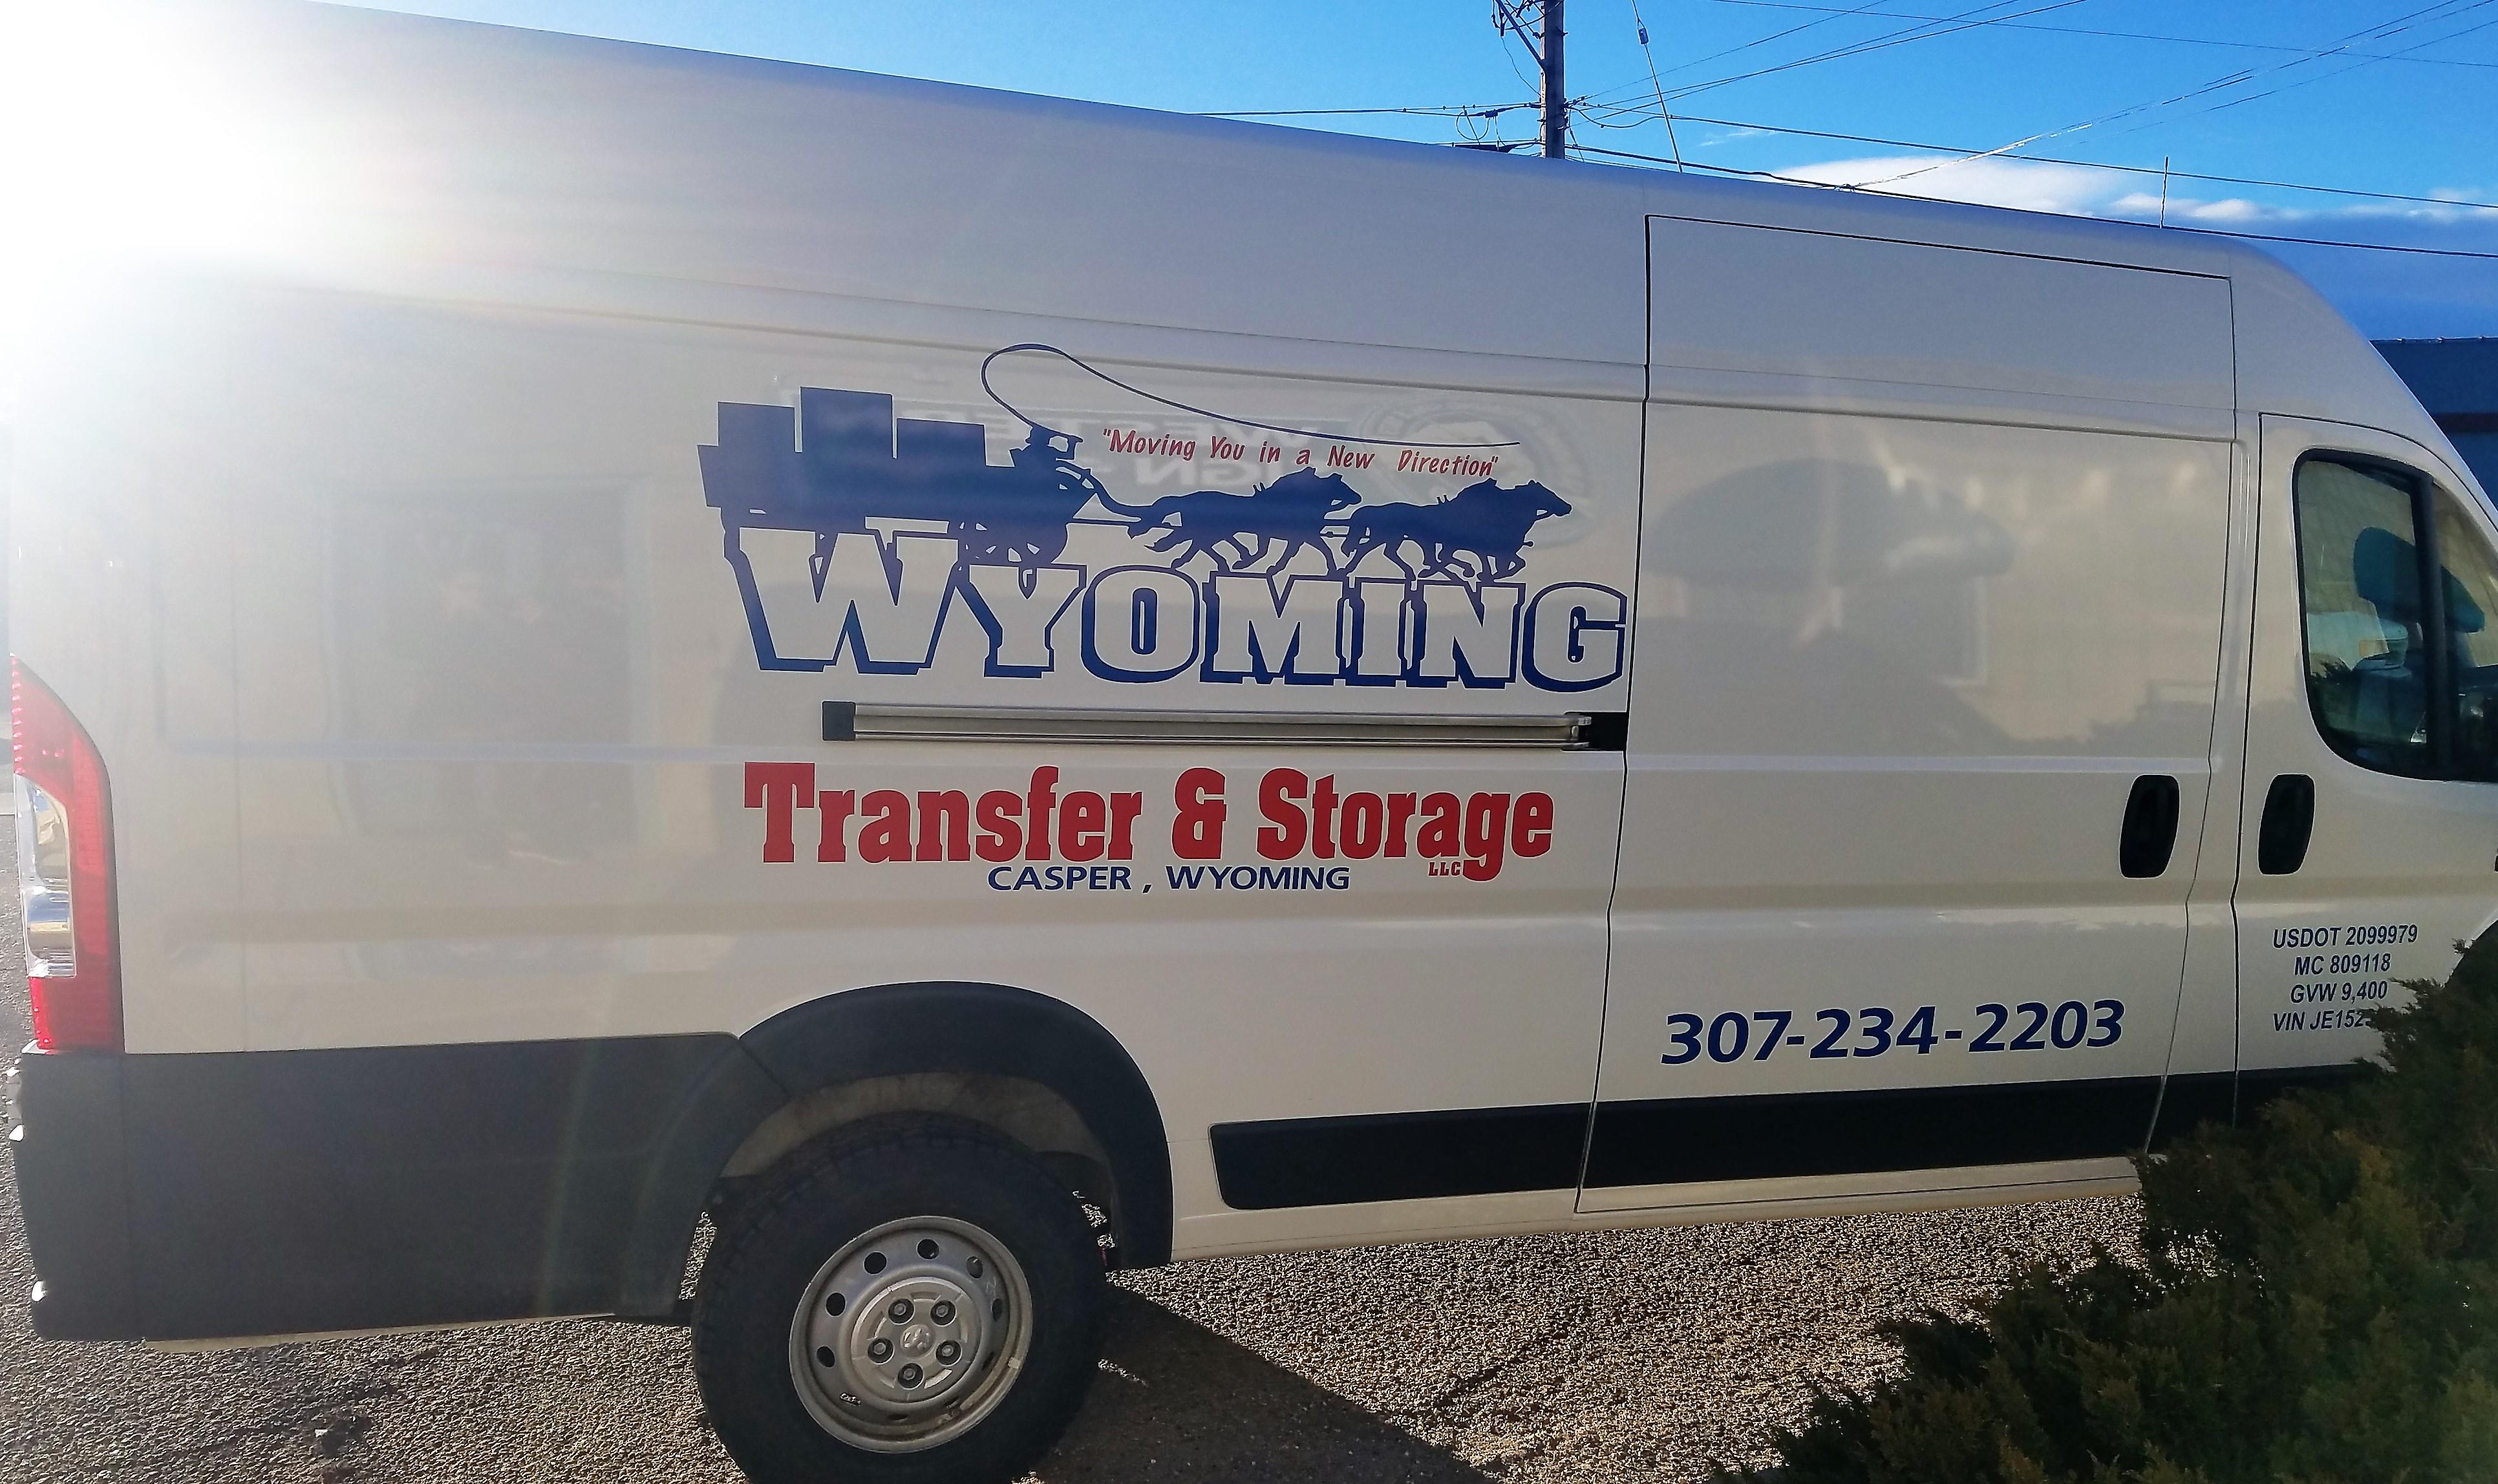 van decals, logo. casper wyoming. moving company